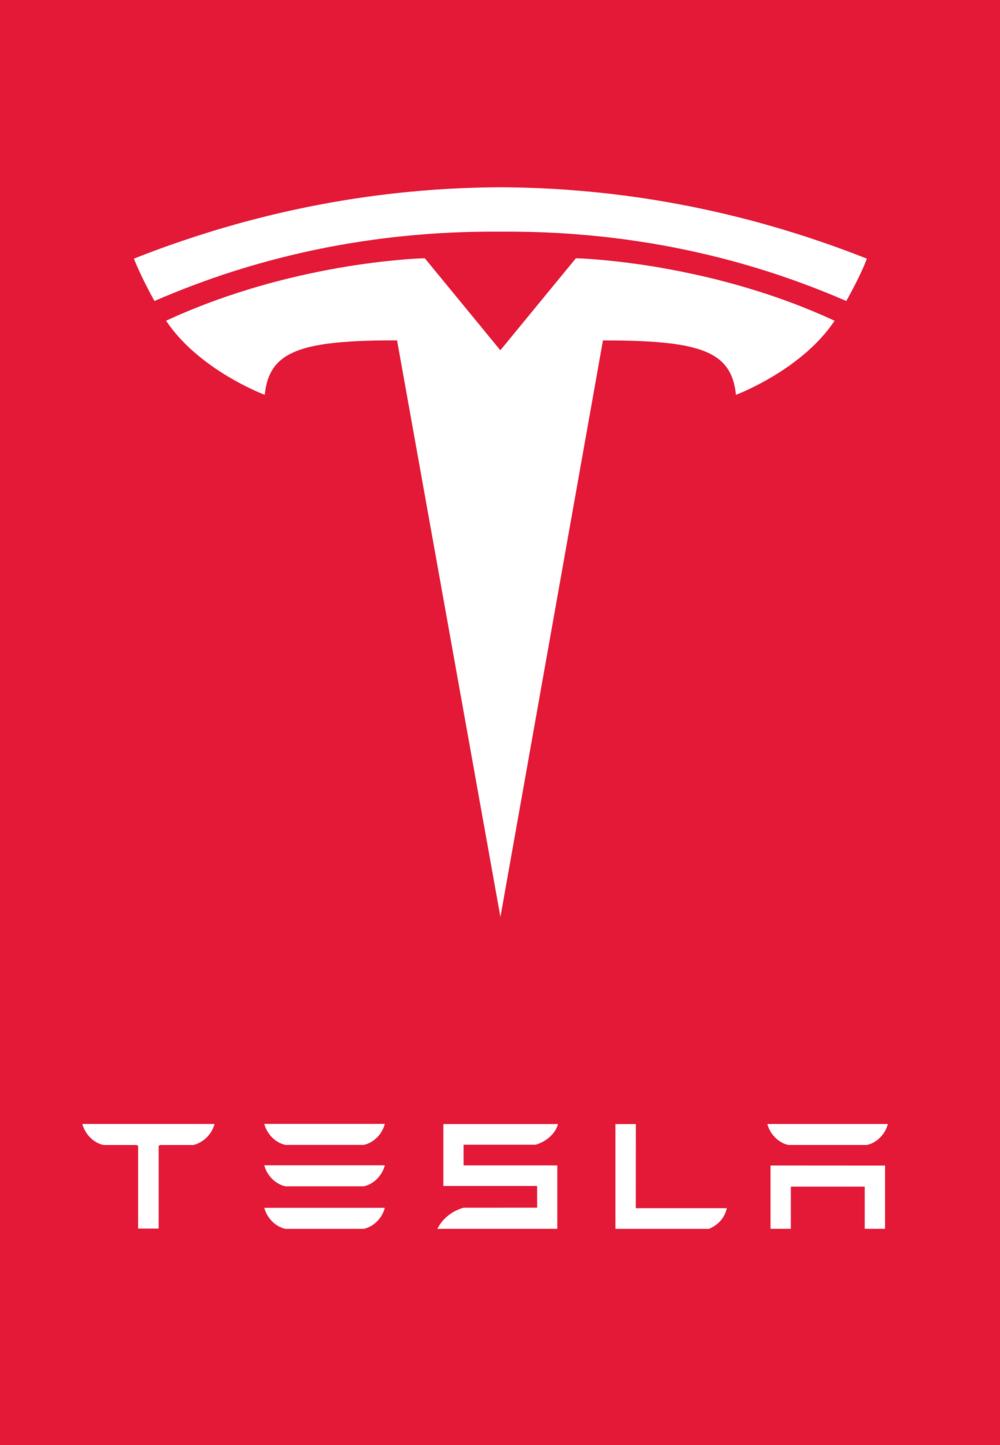 Tesla-Motors-logo.png